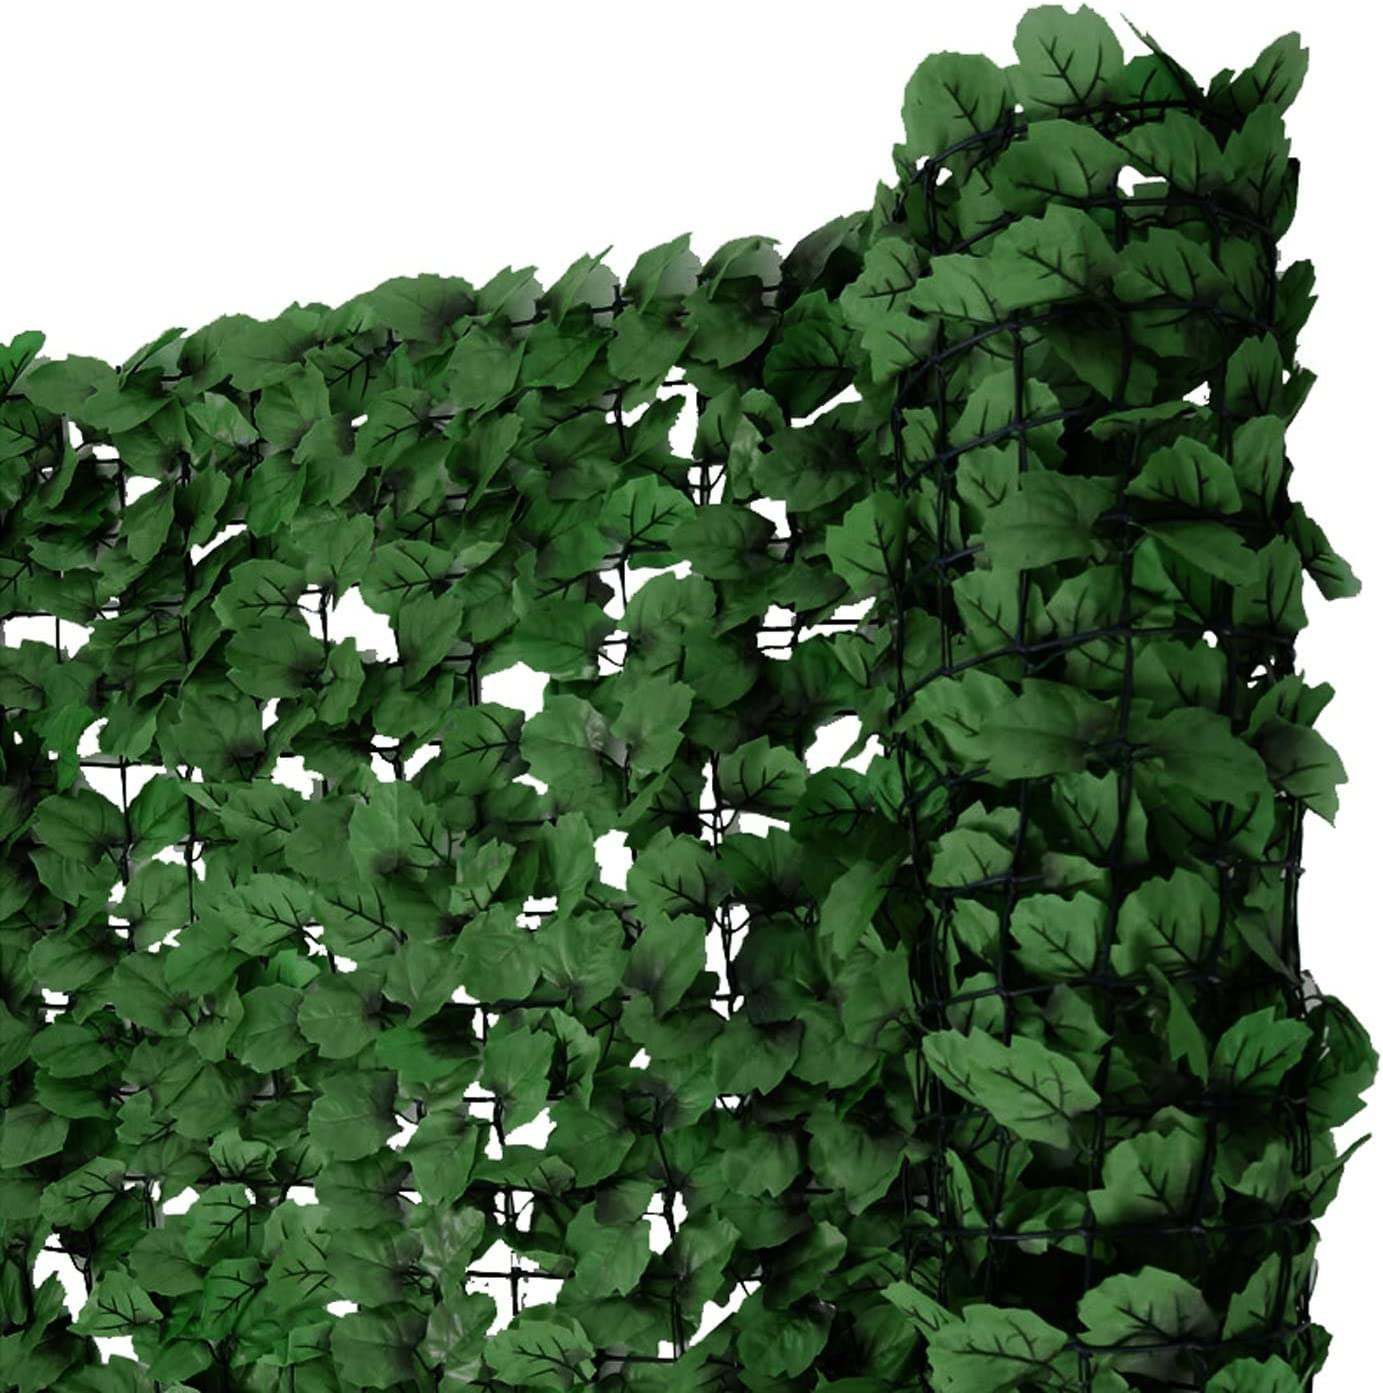 Mendler Sichtschutz Windschutz Verkleidung Fur Balkon Terrasse Zaun Blatt Dunkel 300 X 150 Cm Amazon De Kuche Haushalt